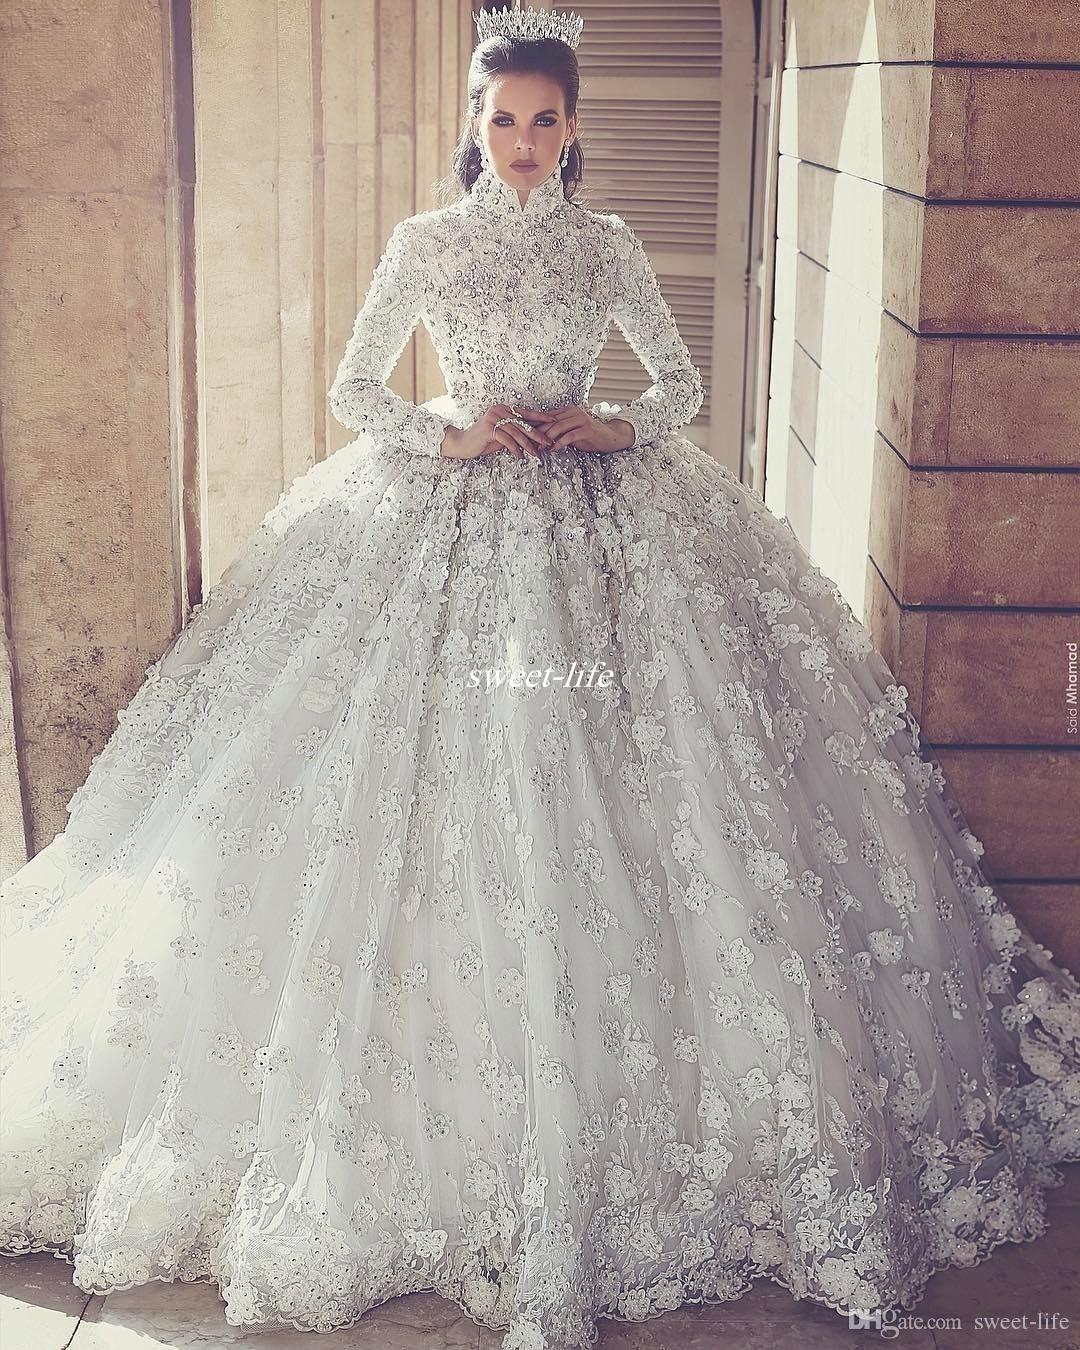 Related Image High Neck Wedding Dress Ball Gowns Wedding High Neck Long Sleeve Wedding Dress [ 1350 x 1080 Pixel ]